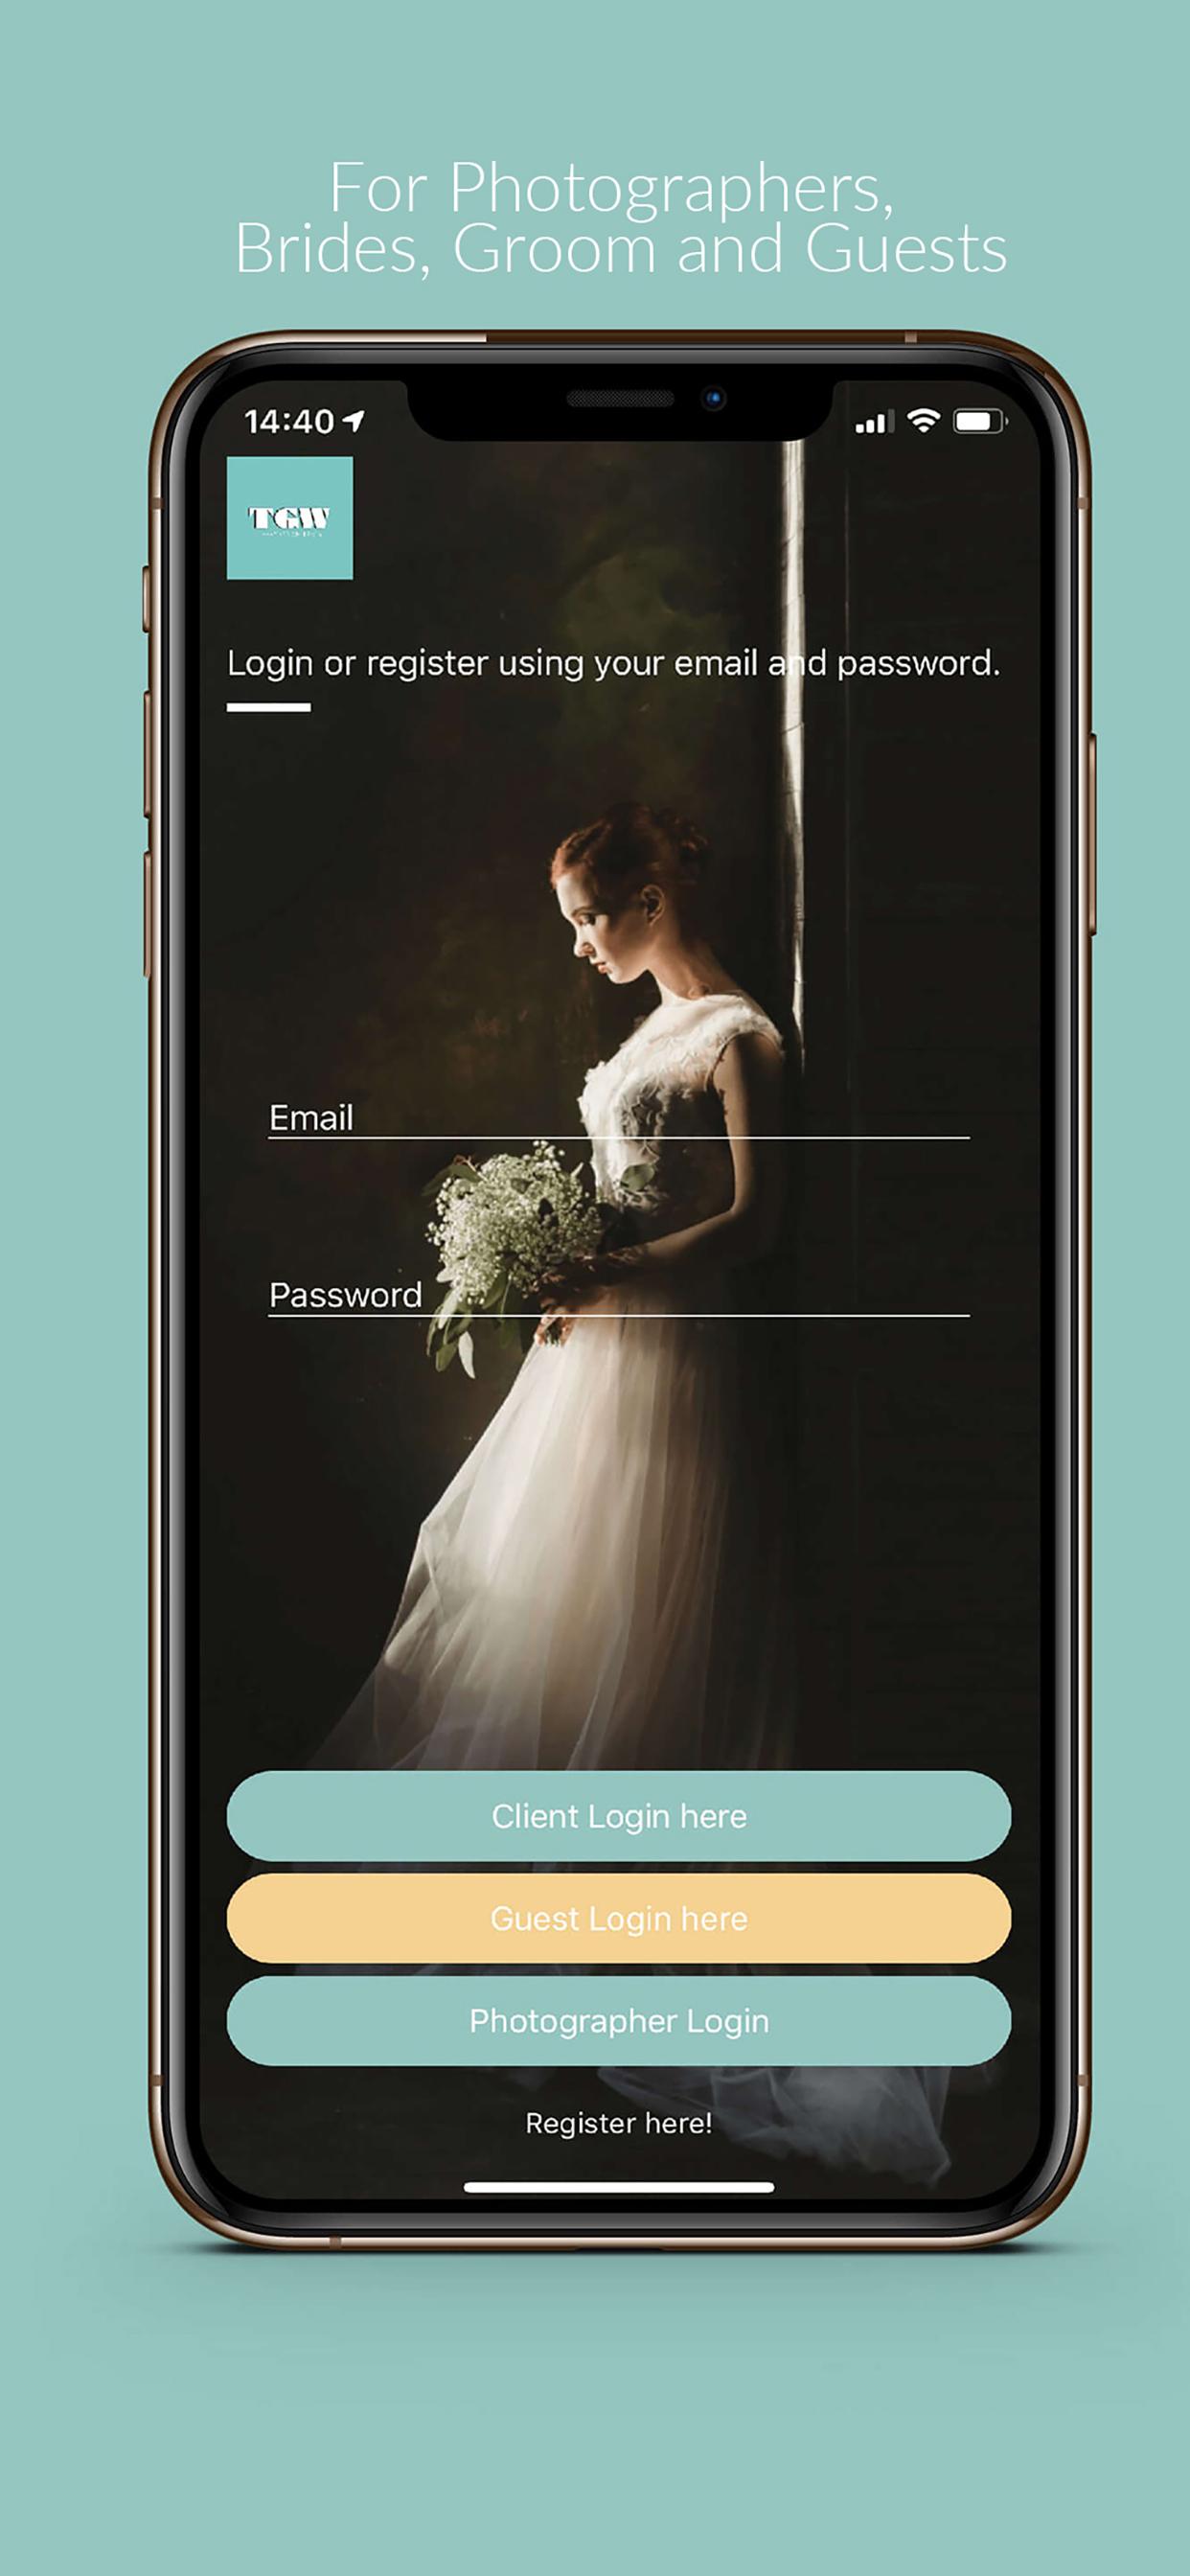 iPhone-Mockup_AppStore1aMax.jpg